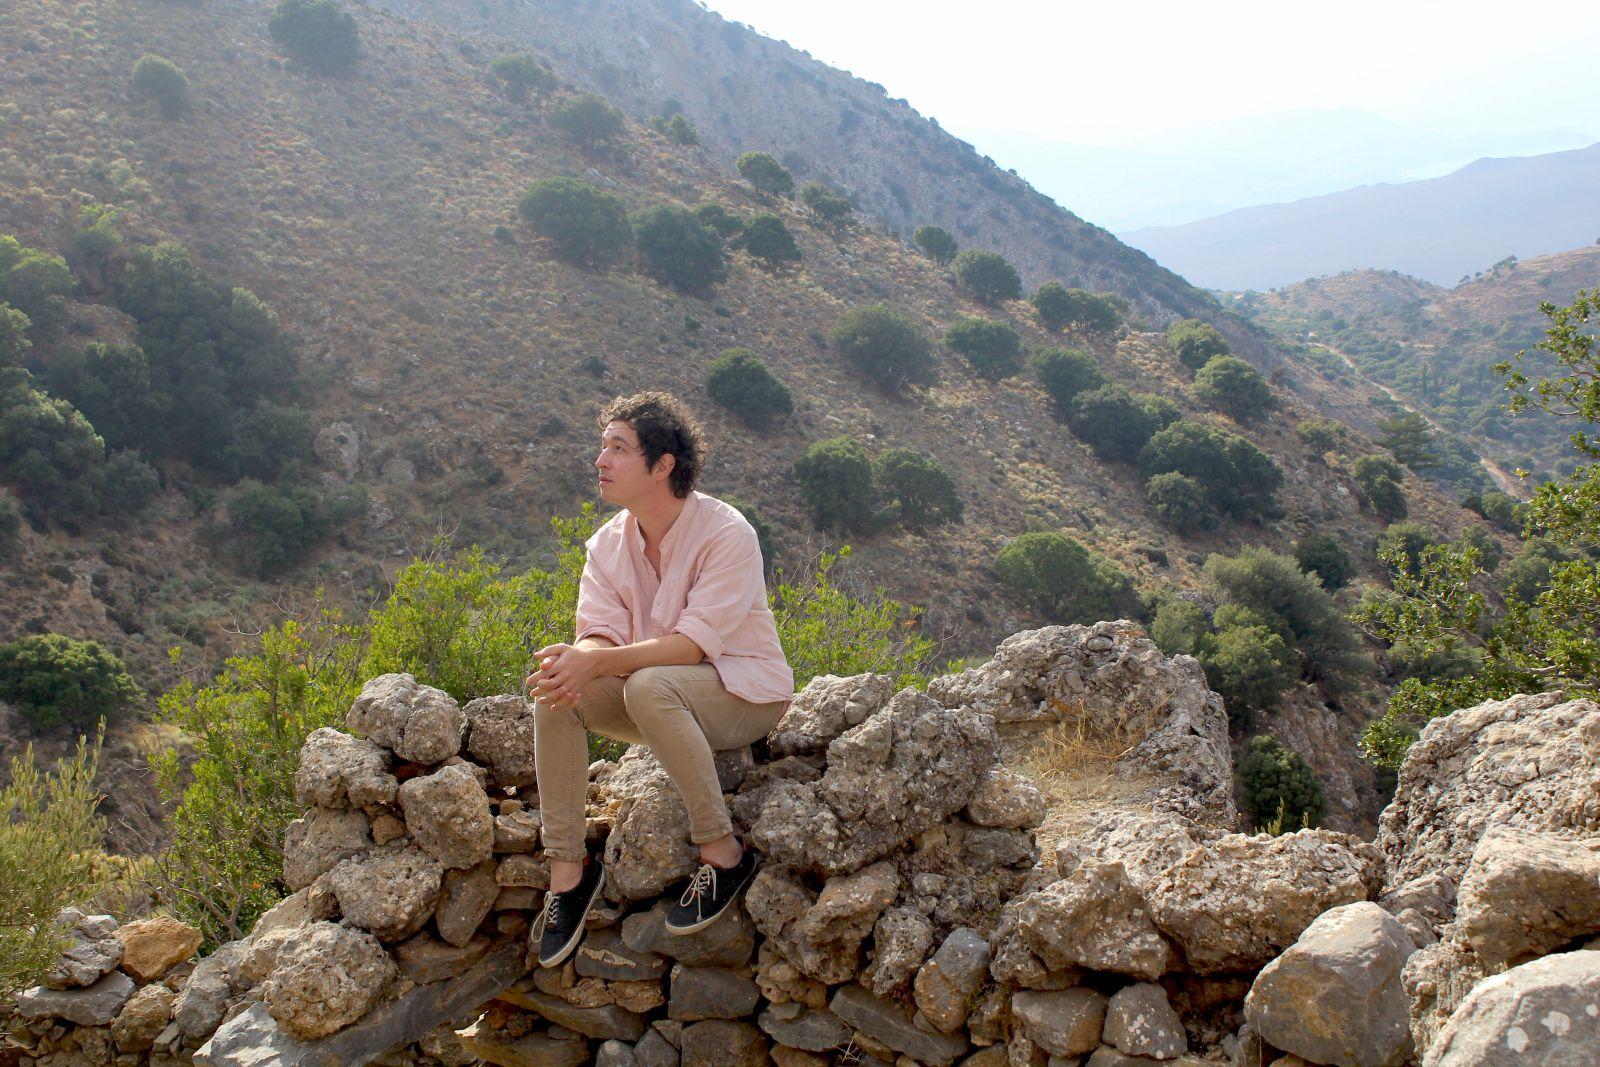 Романтика для двоих: Дмитрий Шуров увез жену на остров